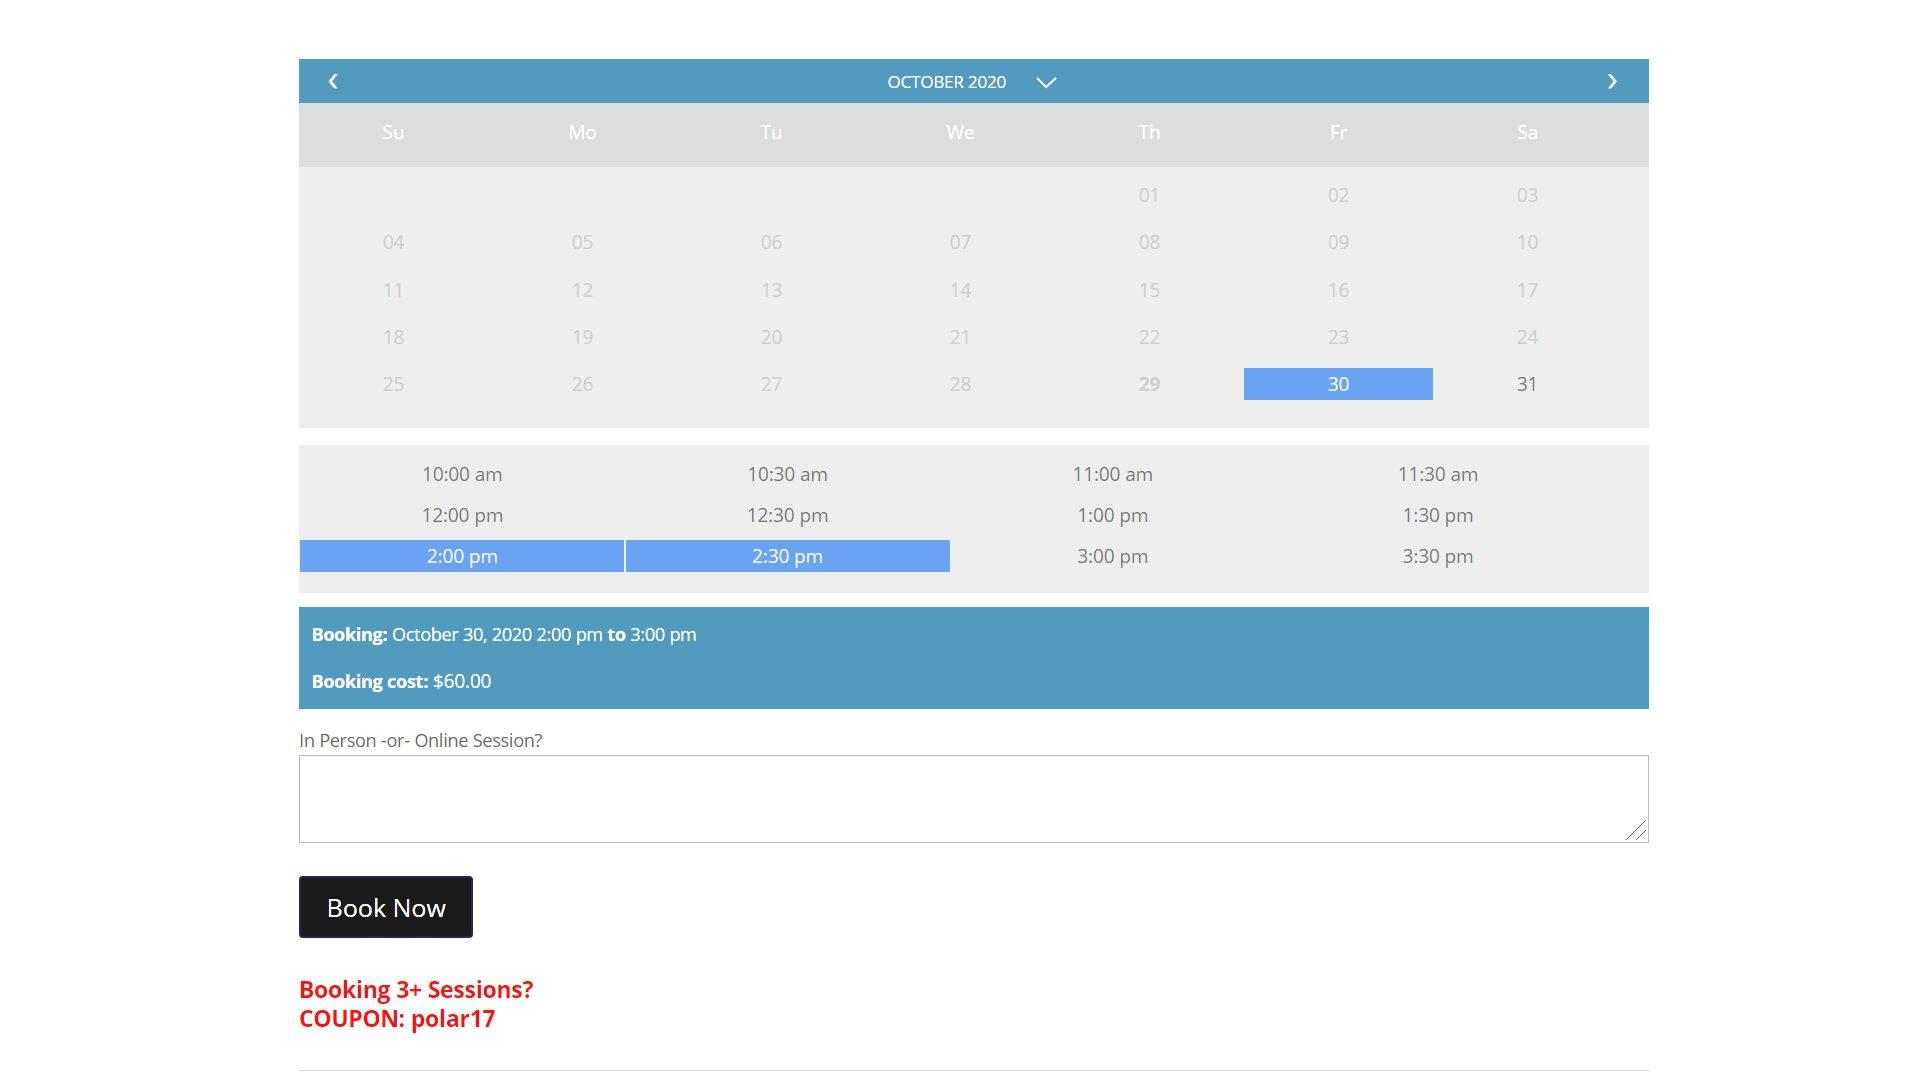 Polar Fitness eCommerce Personal Training Booking Calendar (3)